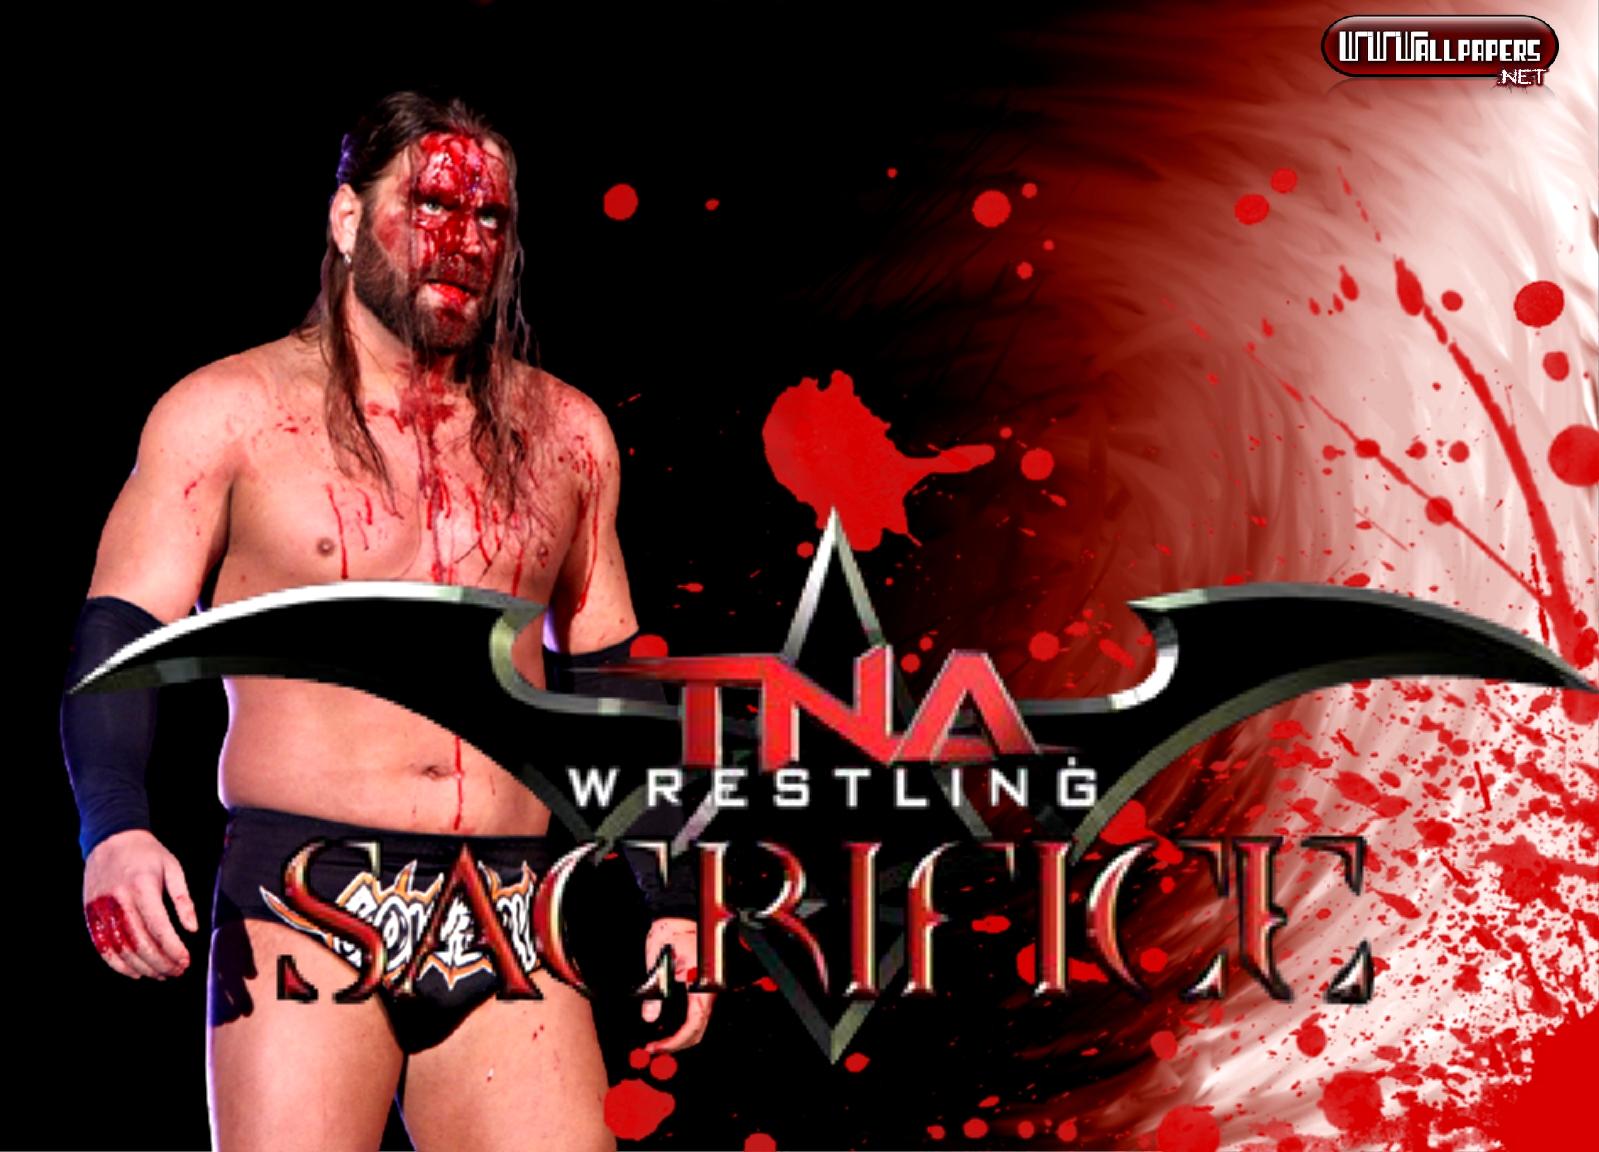 http://1.bp.blogspot.com/-4twN9THE8yU/T4hxYvQm-YI/AAAAAAAAB_4/AnFj37Gbnso/s1600/tna+Sacrifice+2012+wallpaper+james+storm+impact+wrestling.jpg